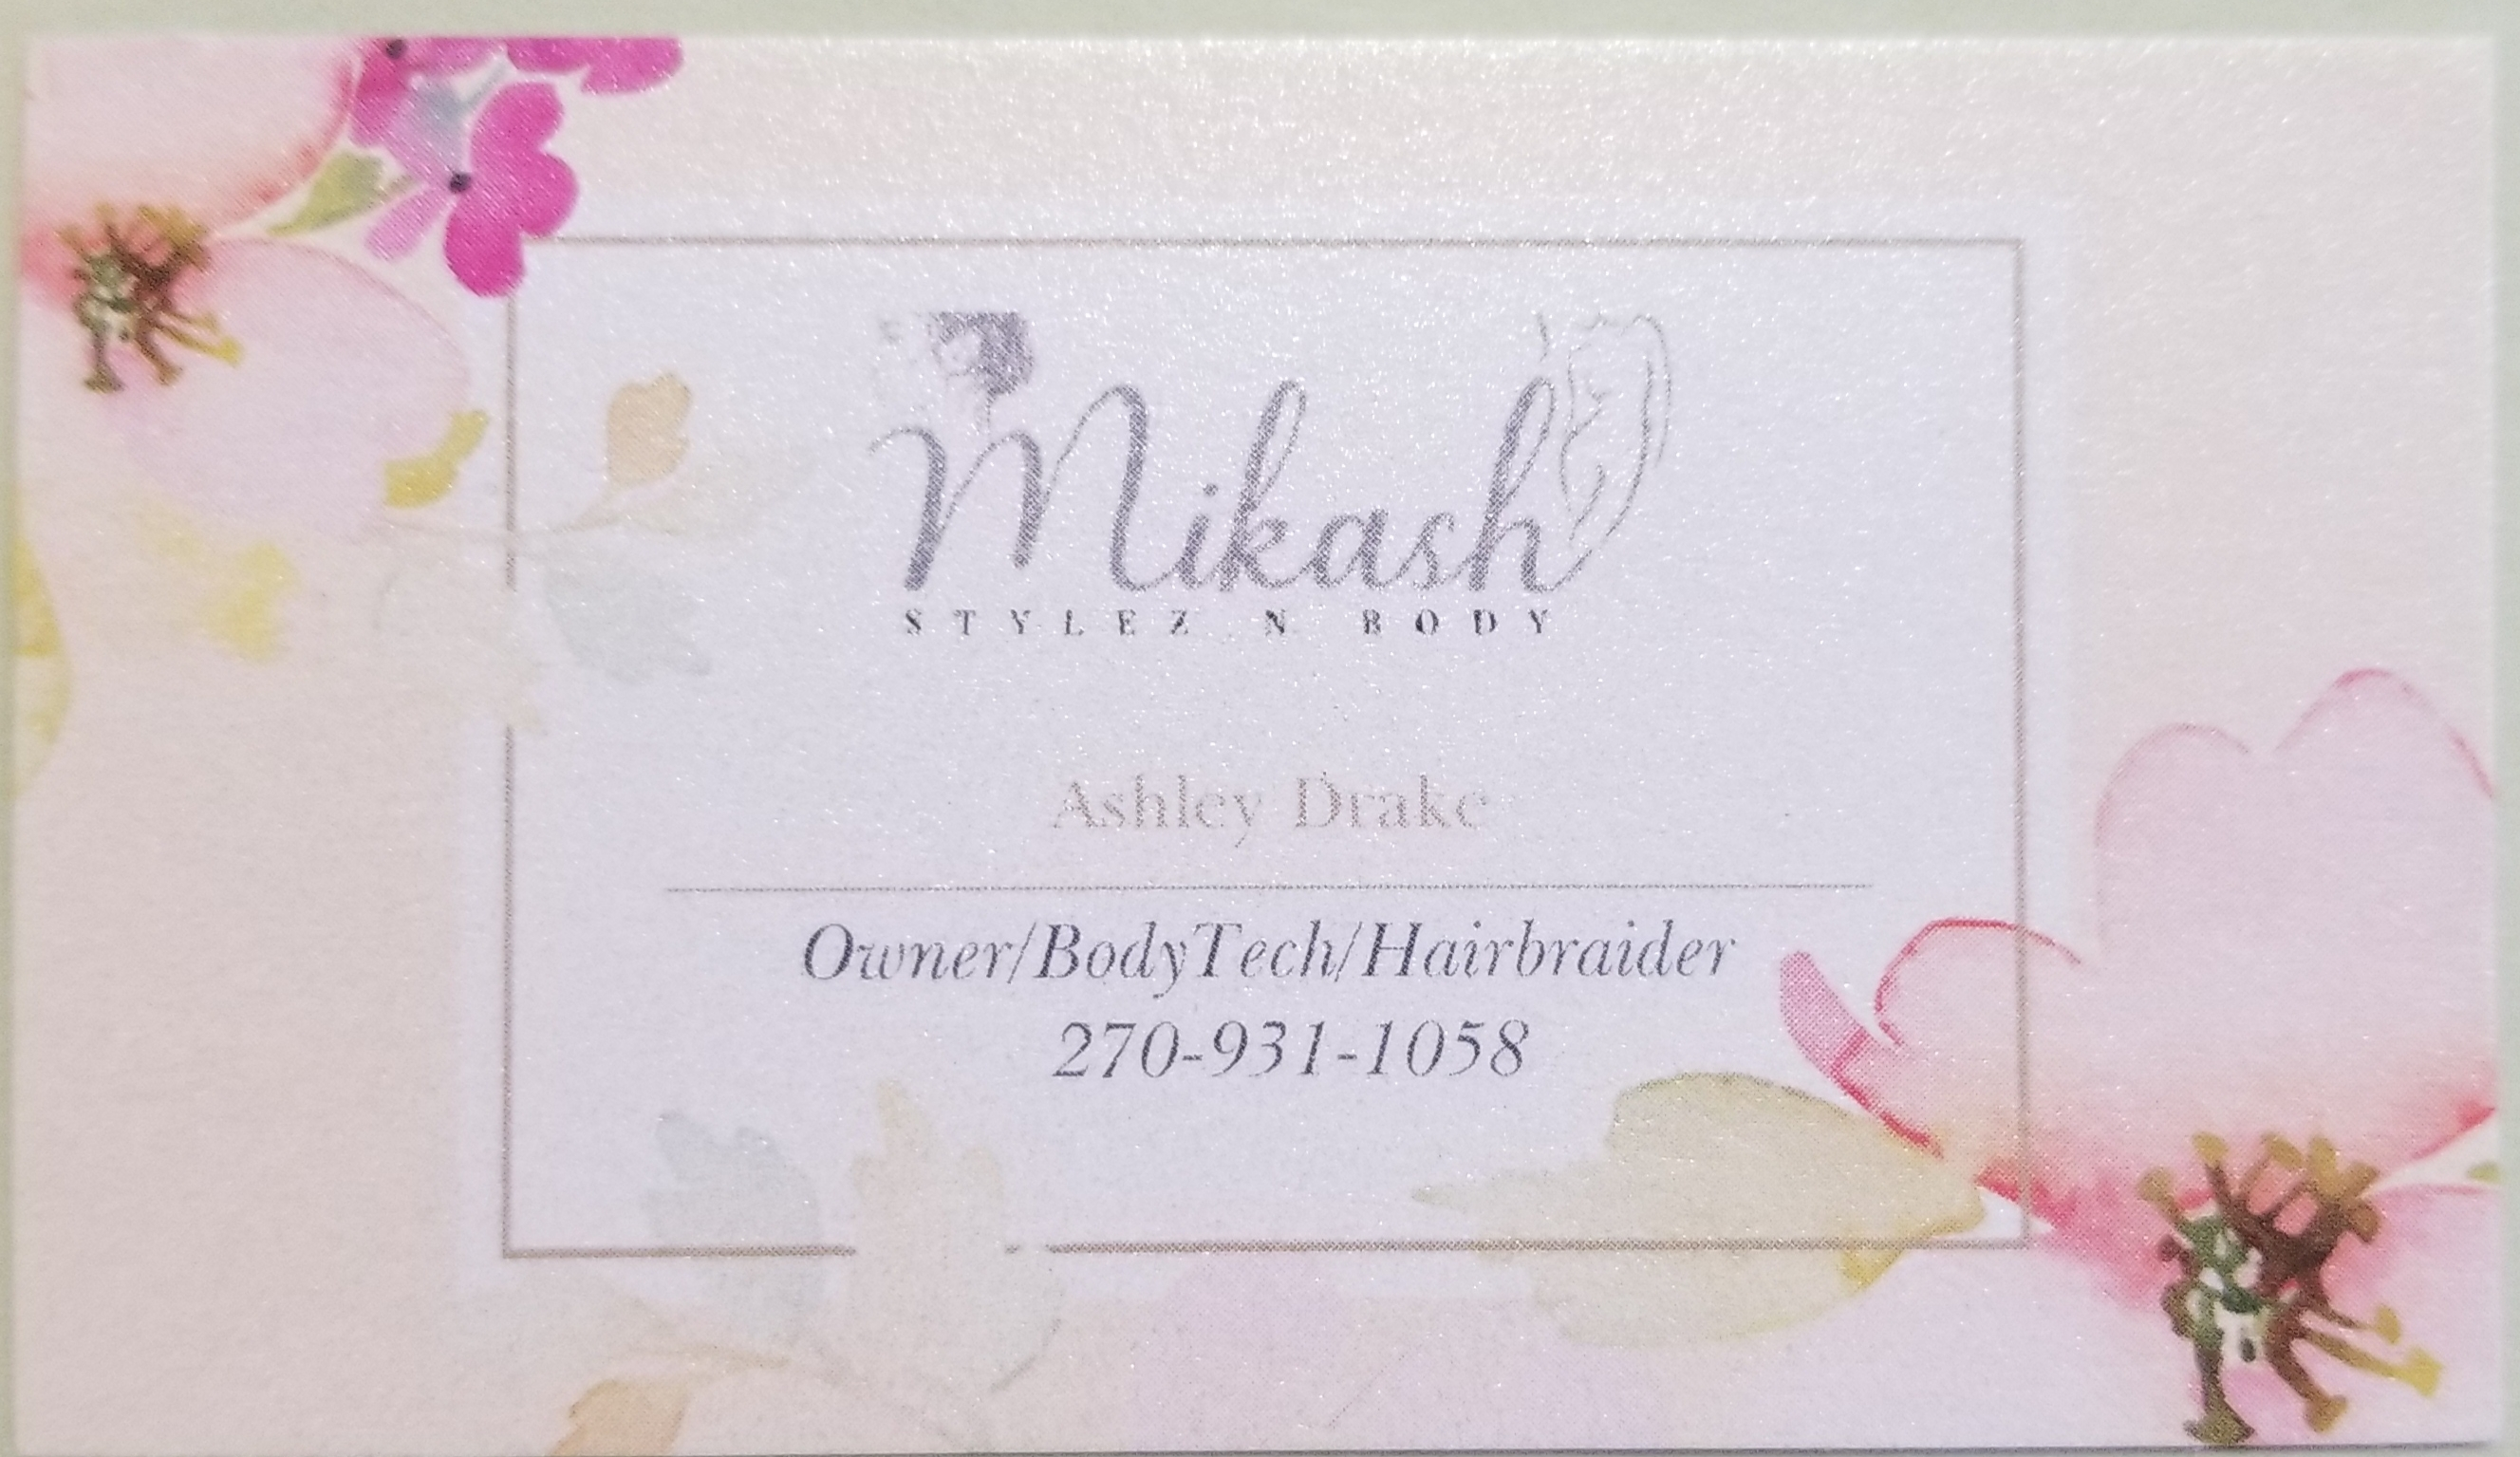 Mikash Stylez & Body